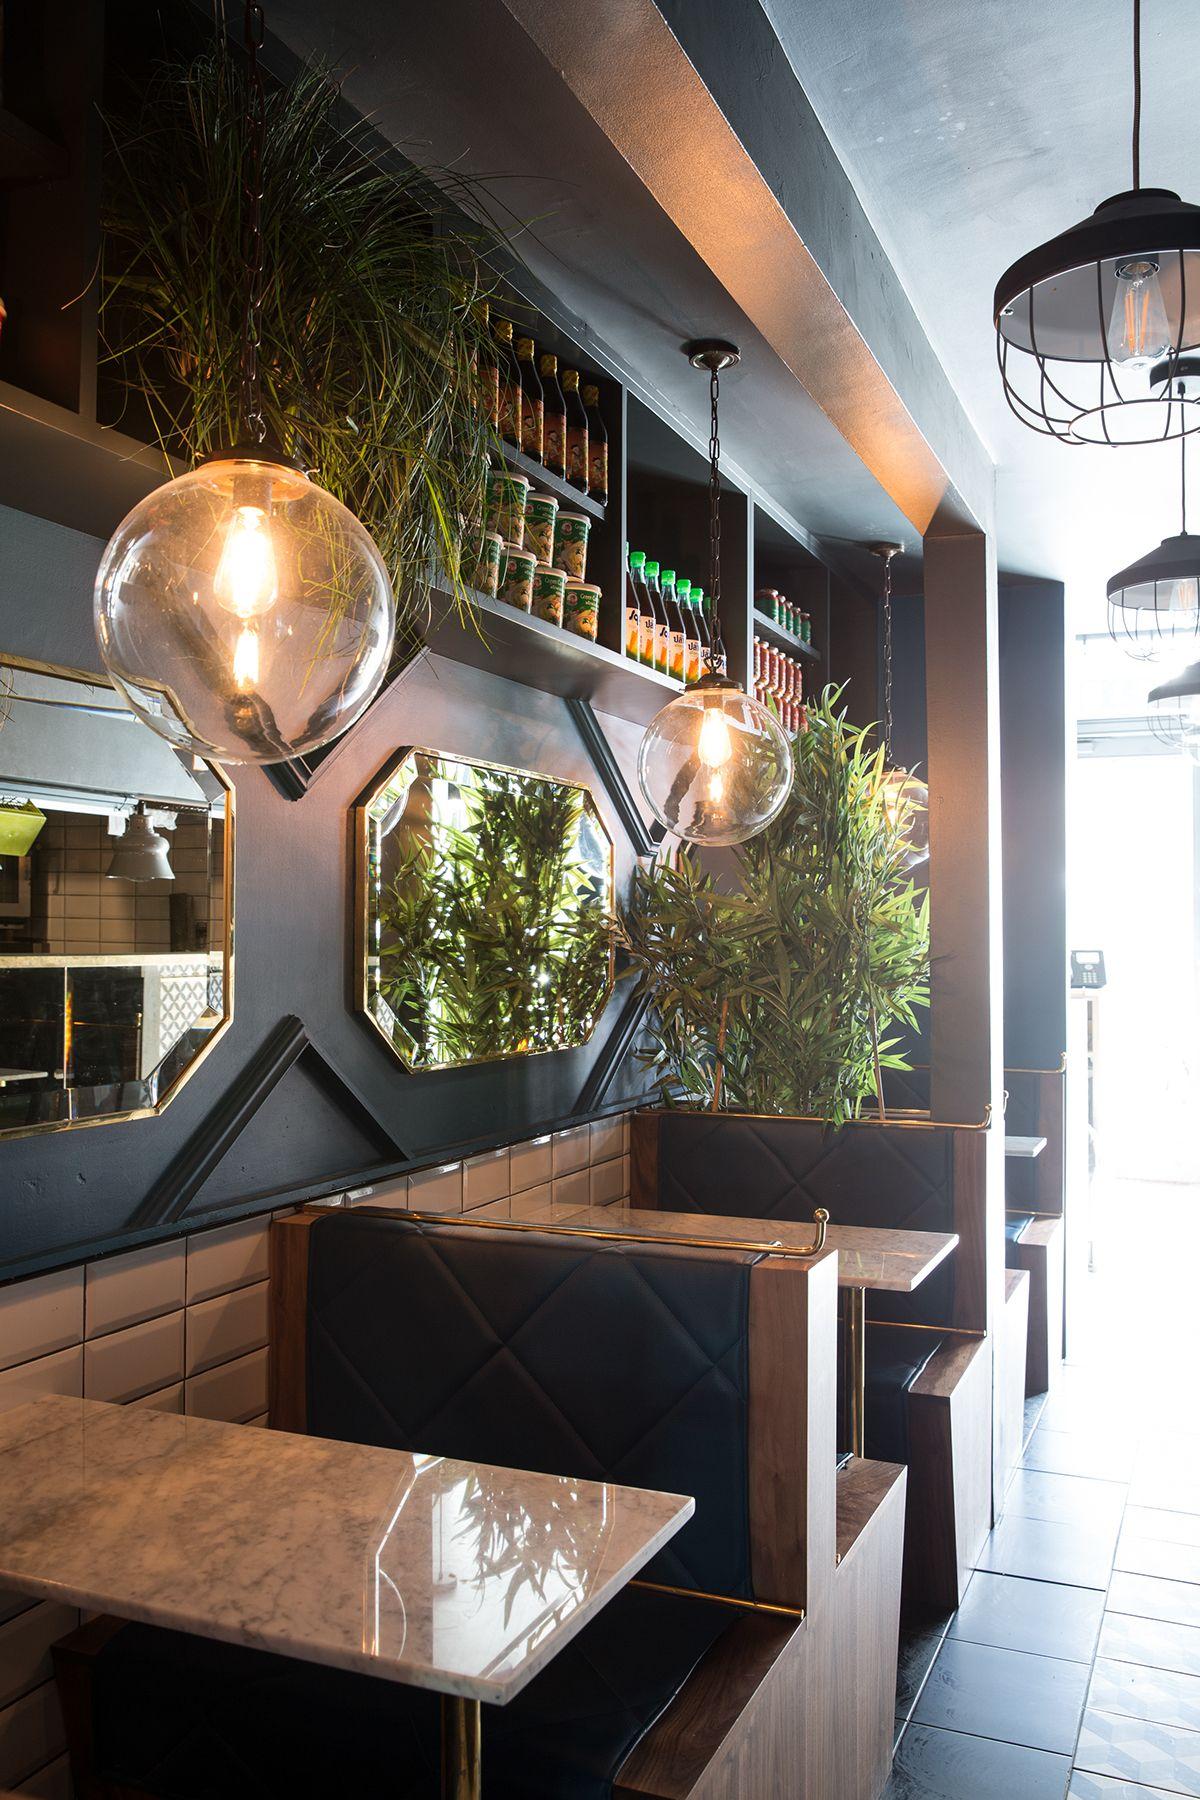 Tootoomoo Restaurant, Crouch End on Behance